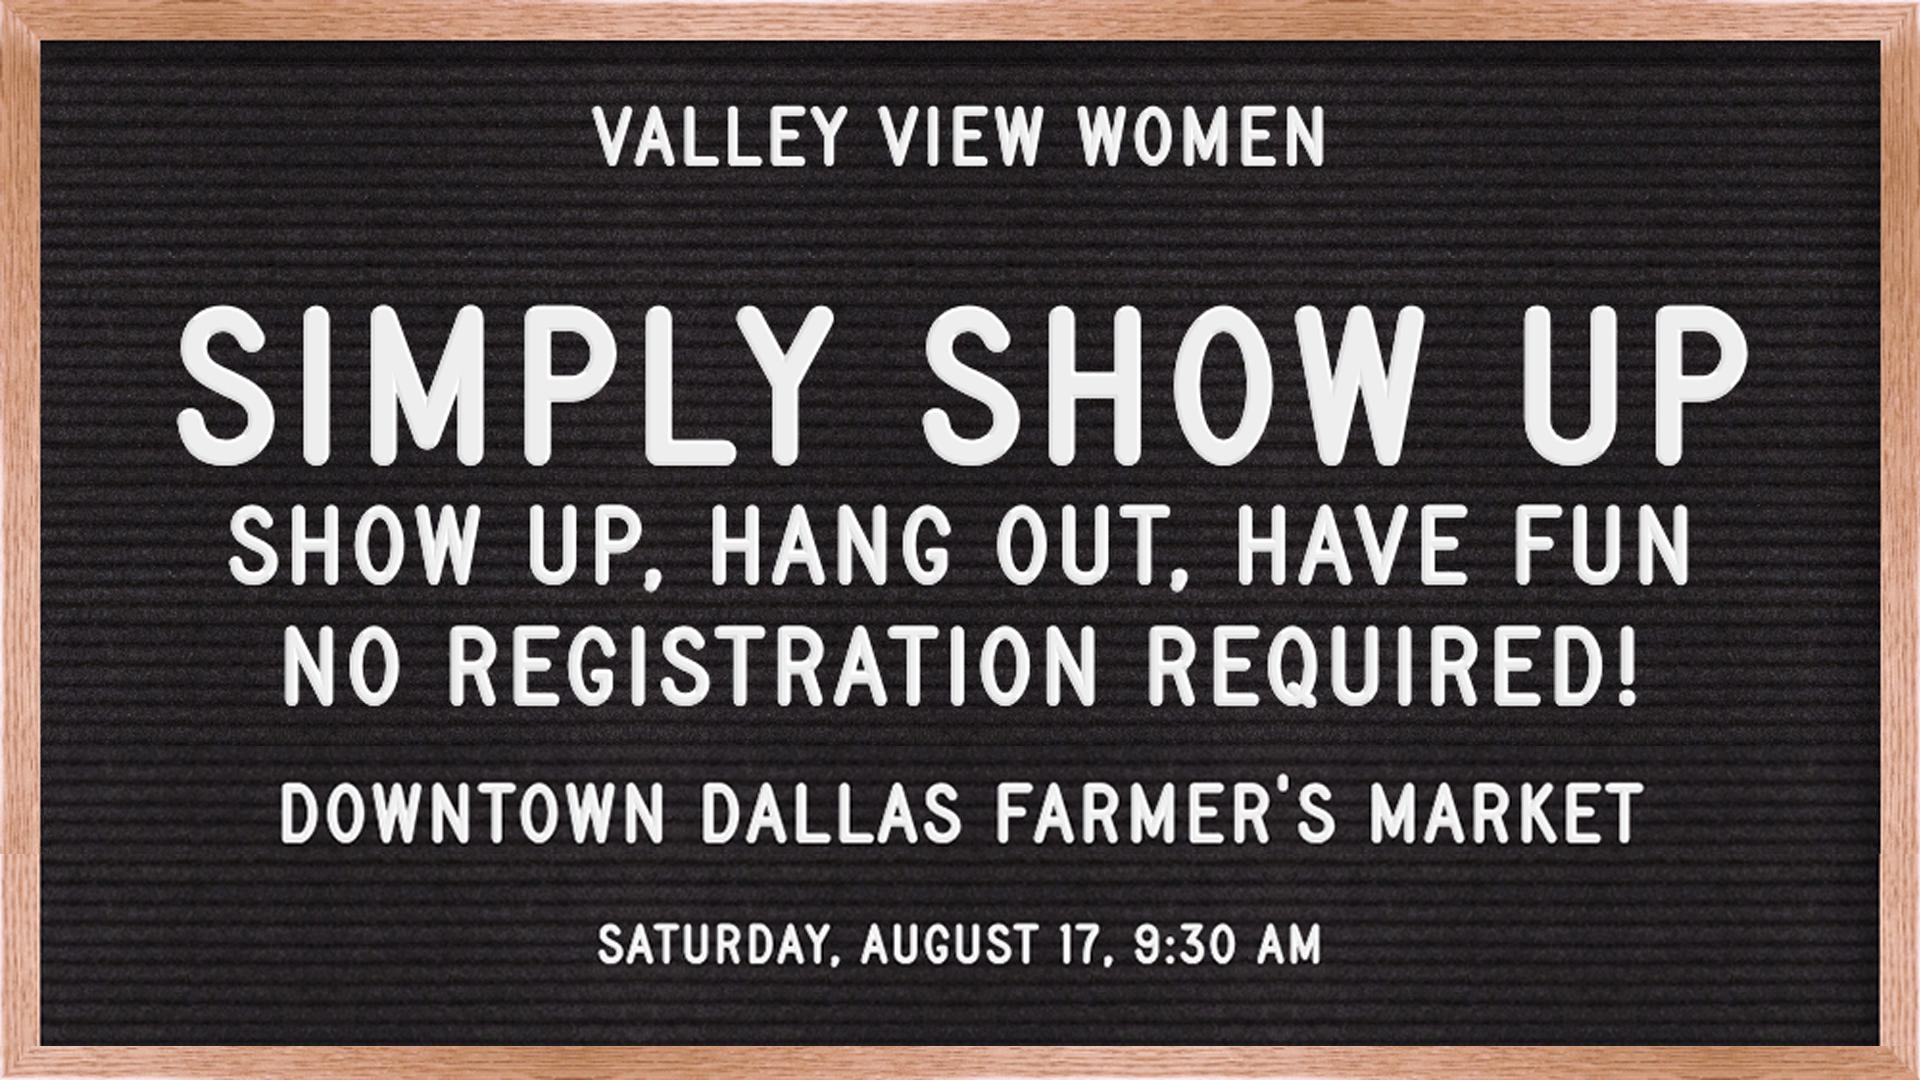 valley view women's event dallas